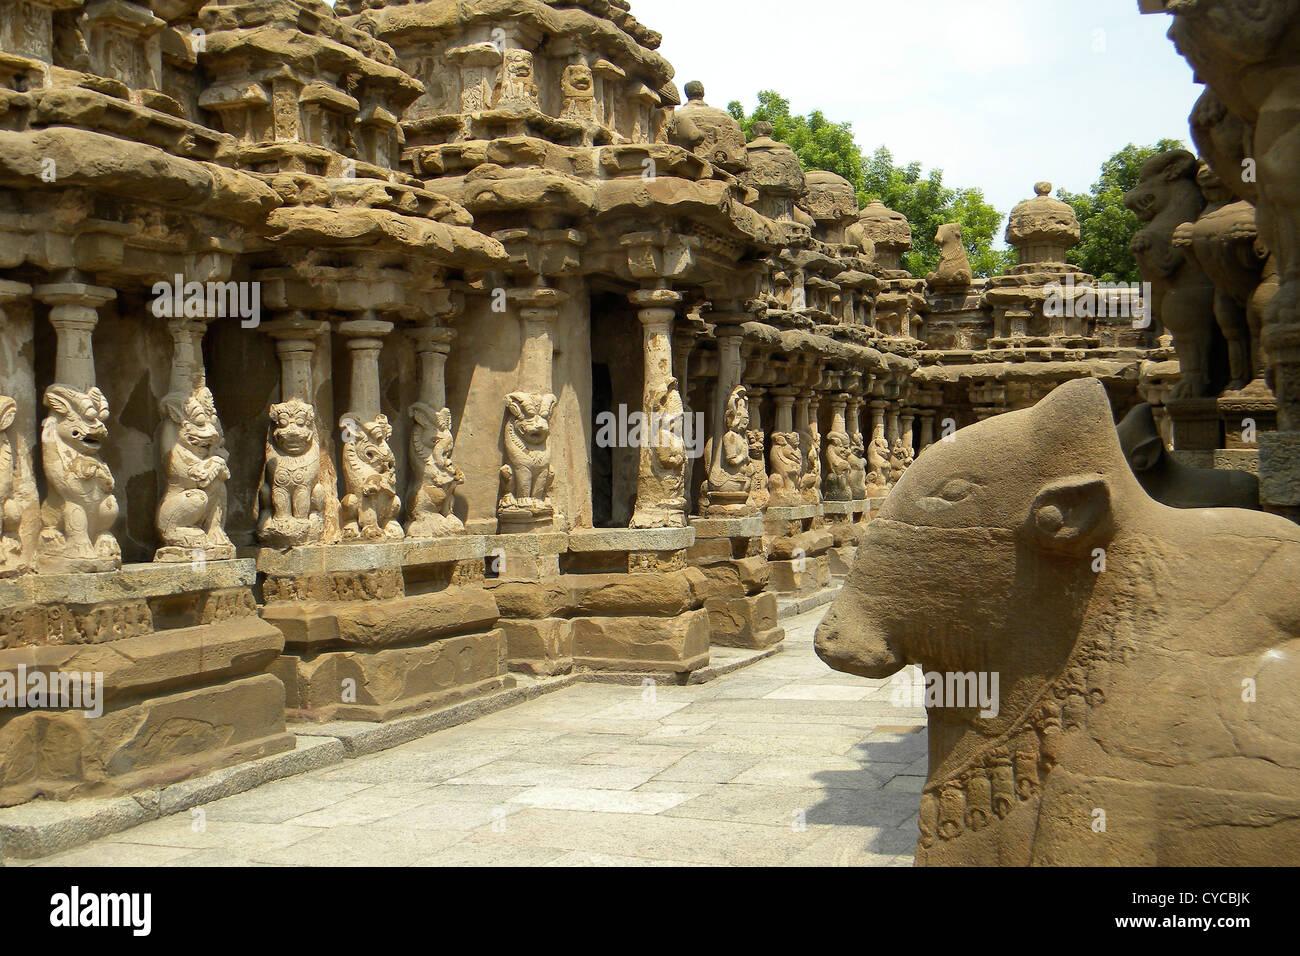 India, Tamil Nadu, Kancheepuram temple - Stock Image